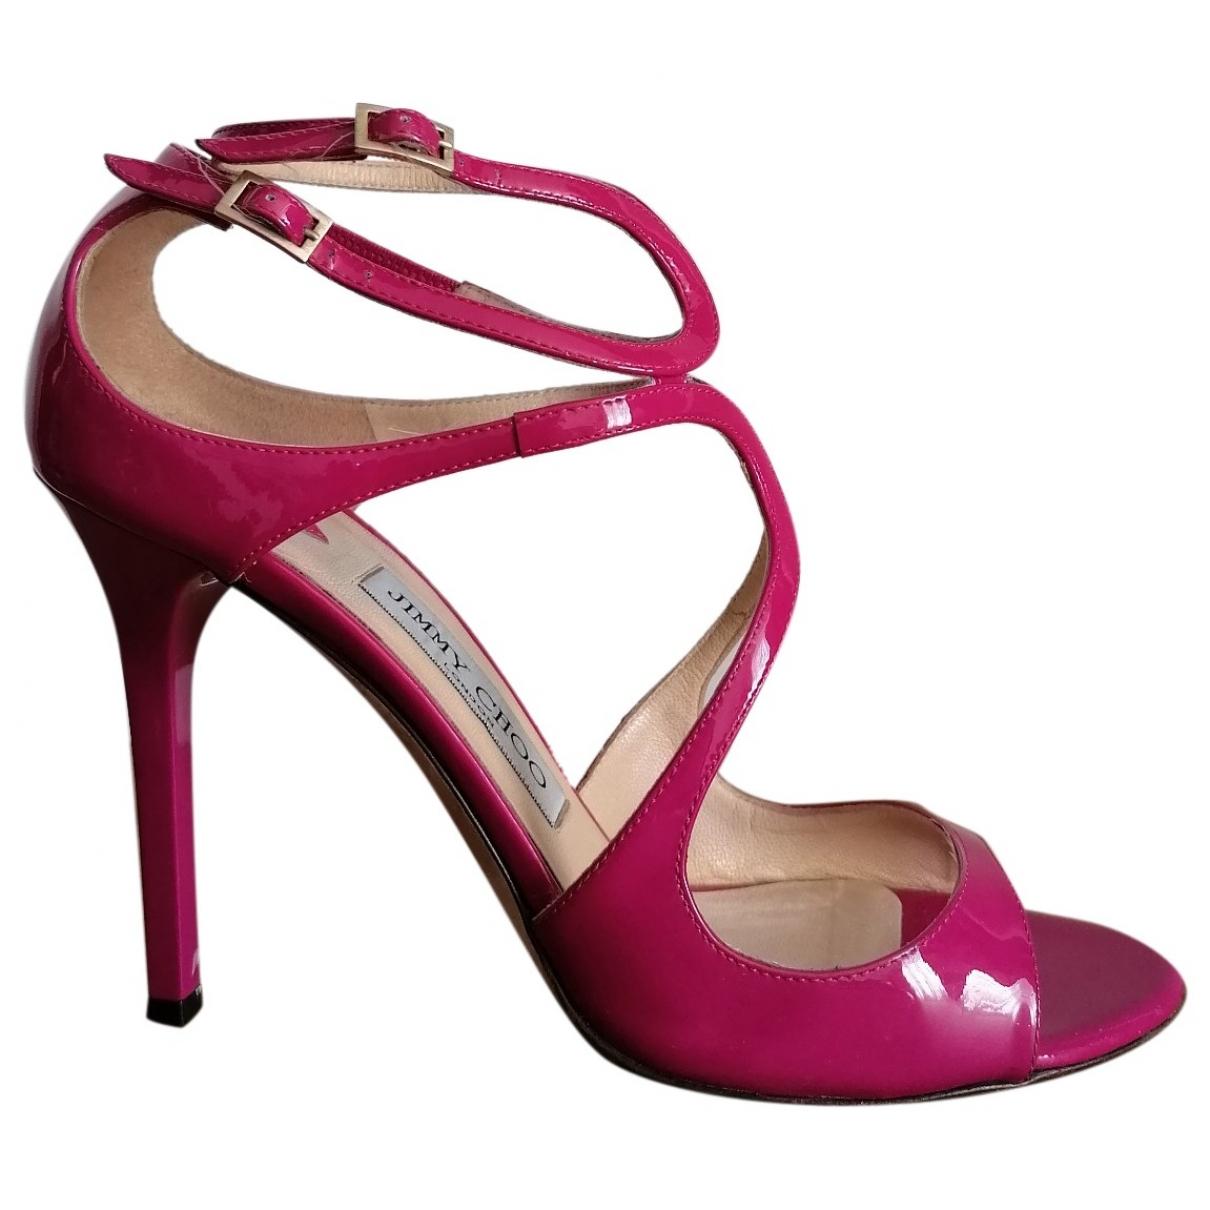 Jimmy Choo - Sandales Lance pour femme en cuir verni - rose